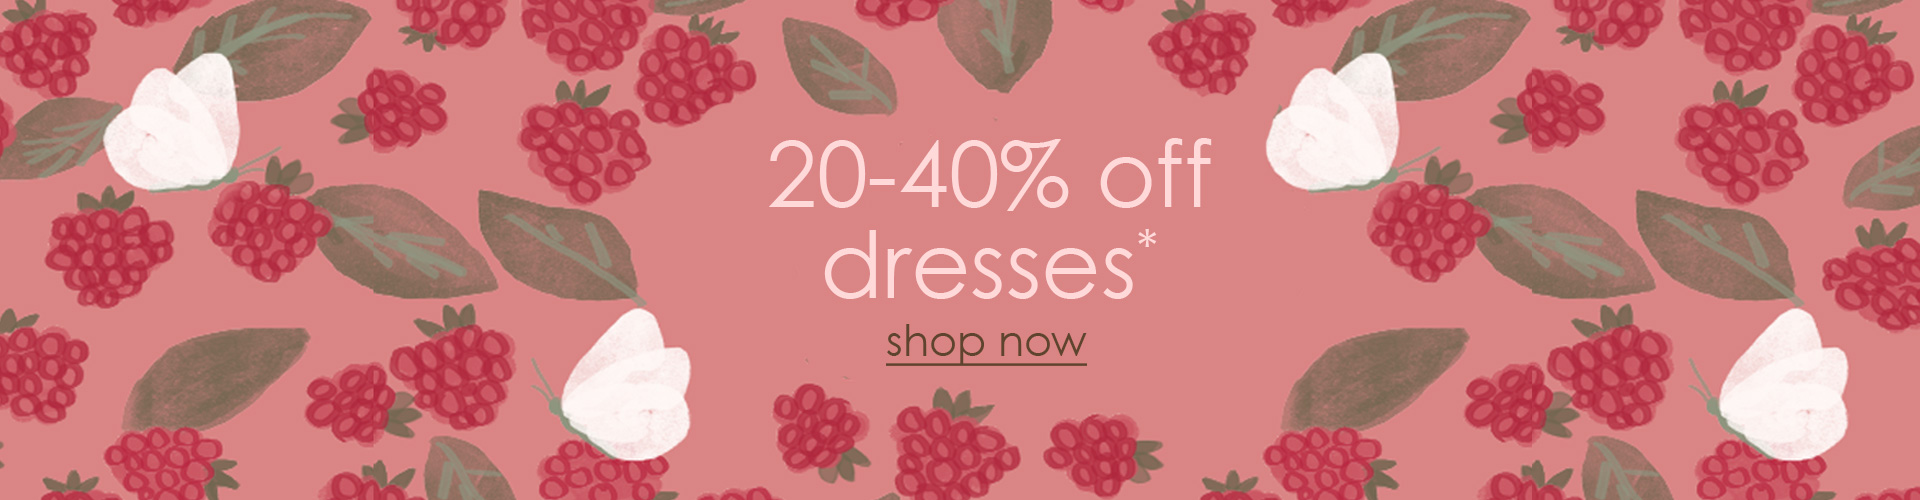 20-40%off Dresses DESKTOP